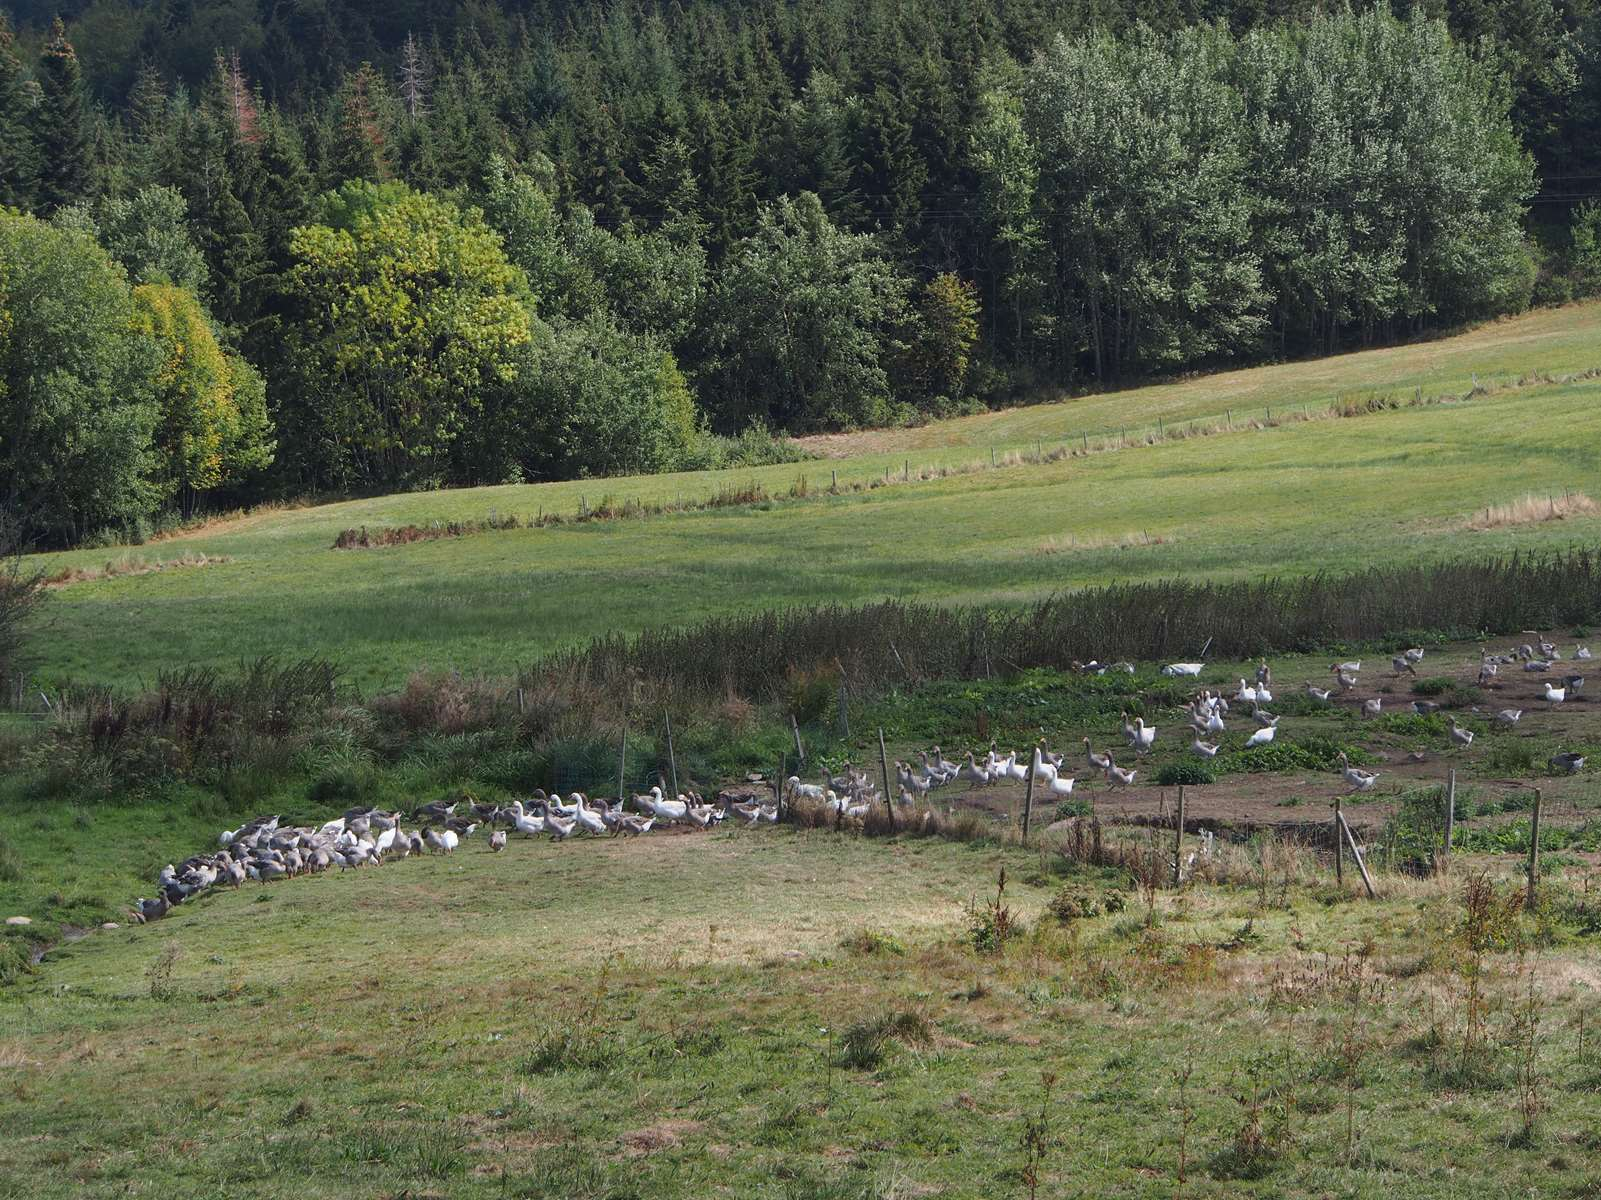 Oies et canards du Kreuzwzeg